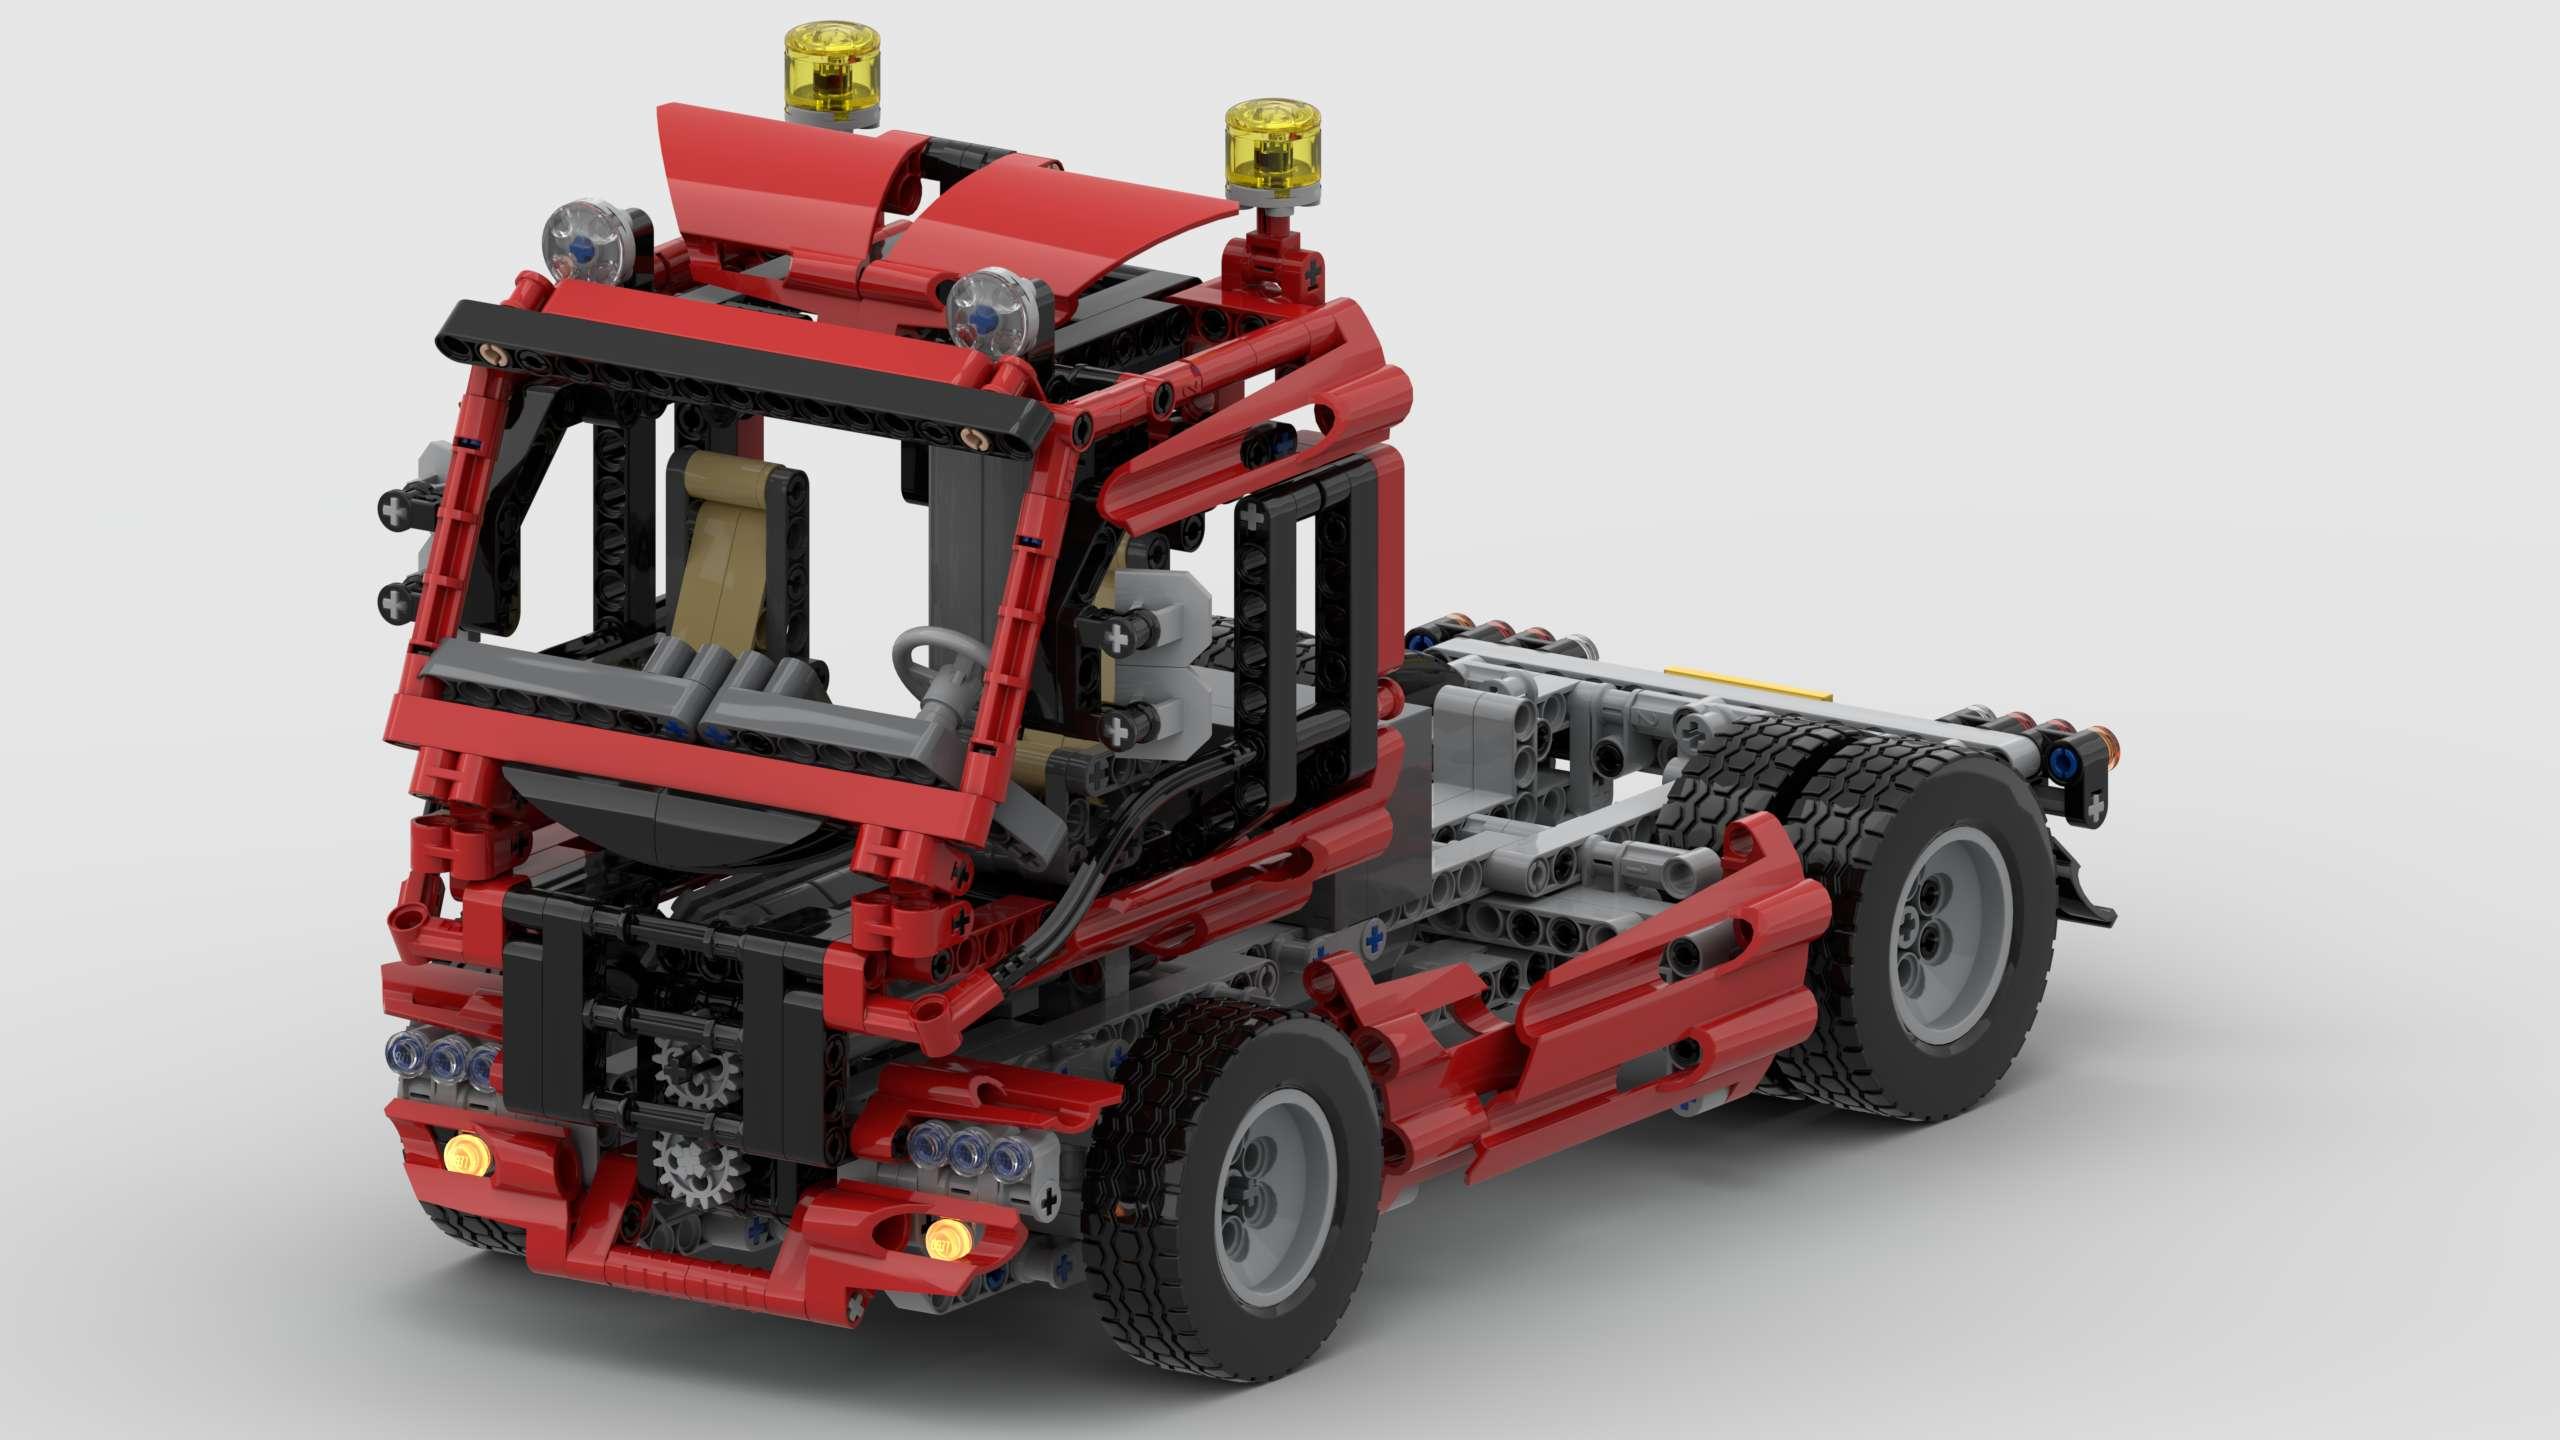 http://mistercreator.de/produkt/lego-8436-truck-custom-rc-umbau/